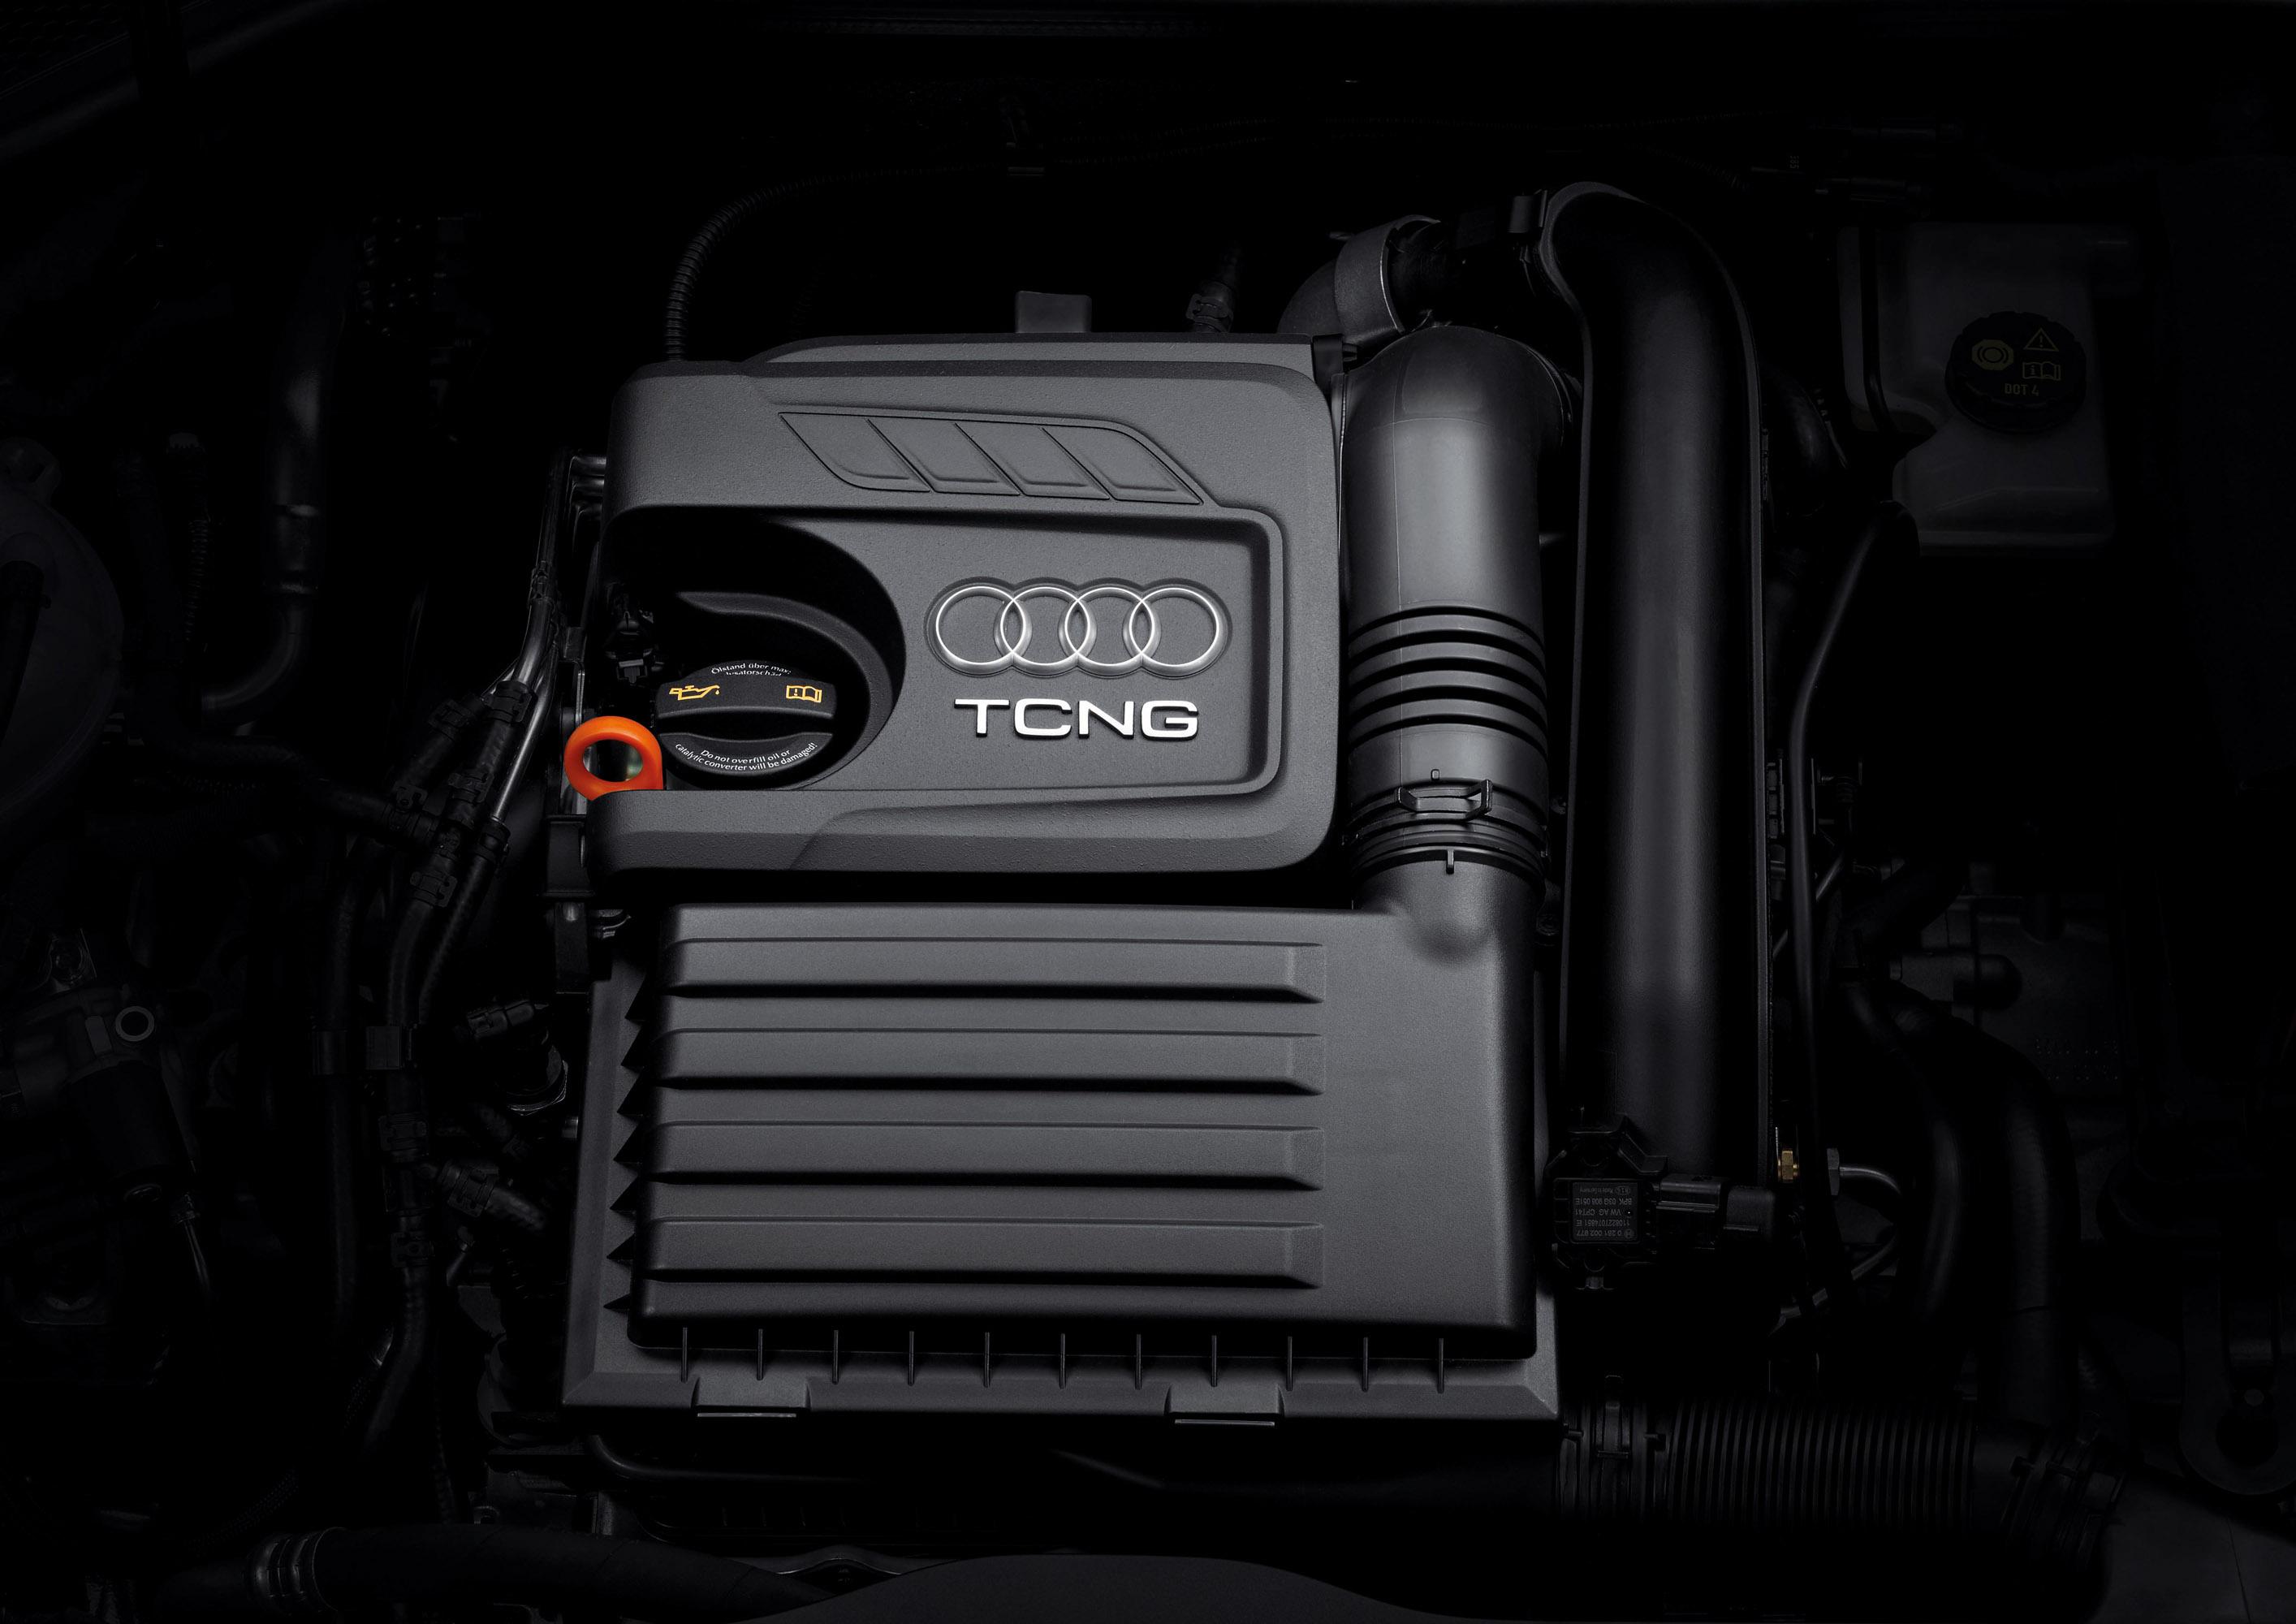 2013 Audi S3 Sportback Engine View